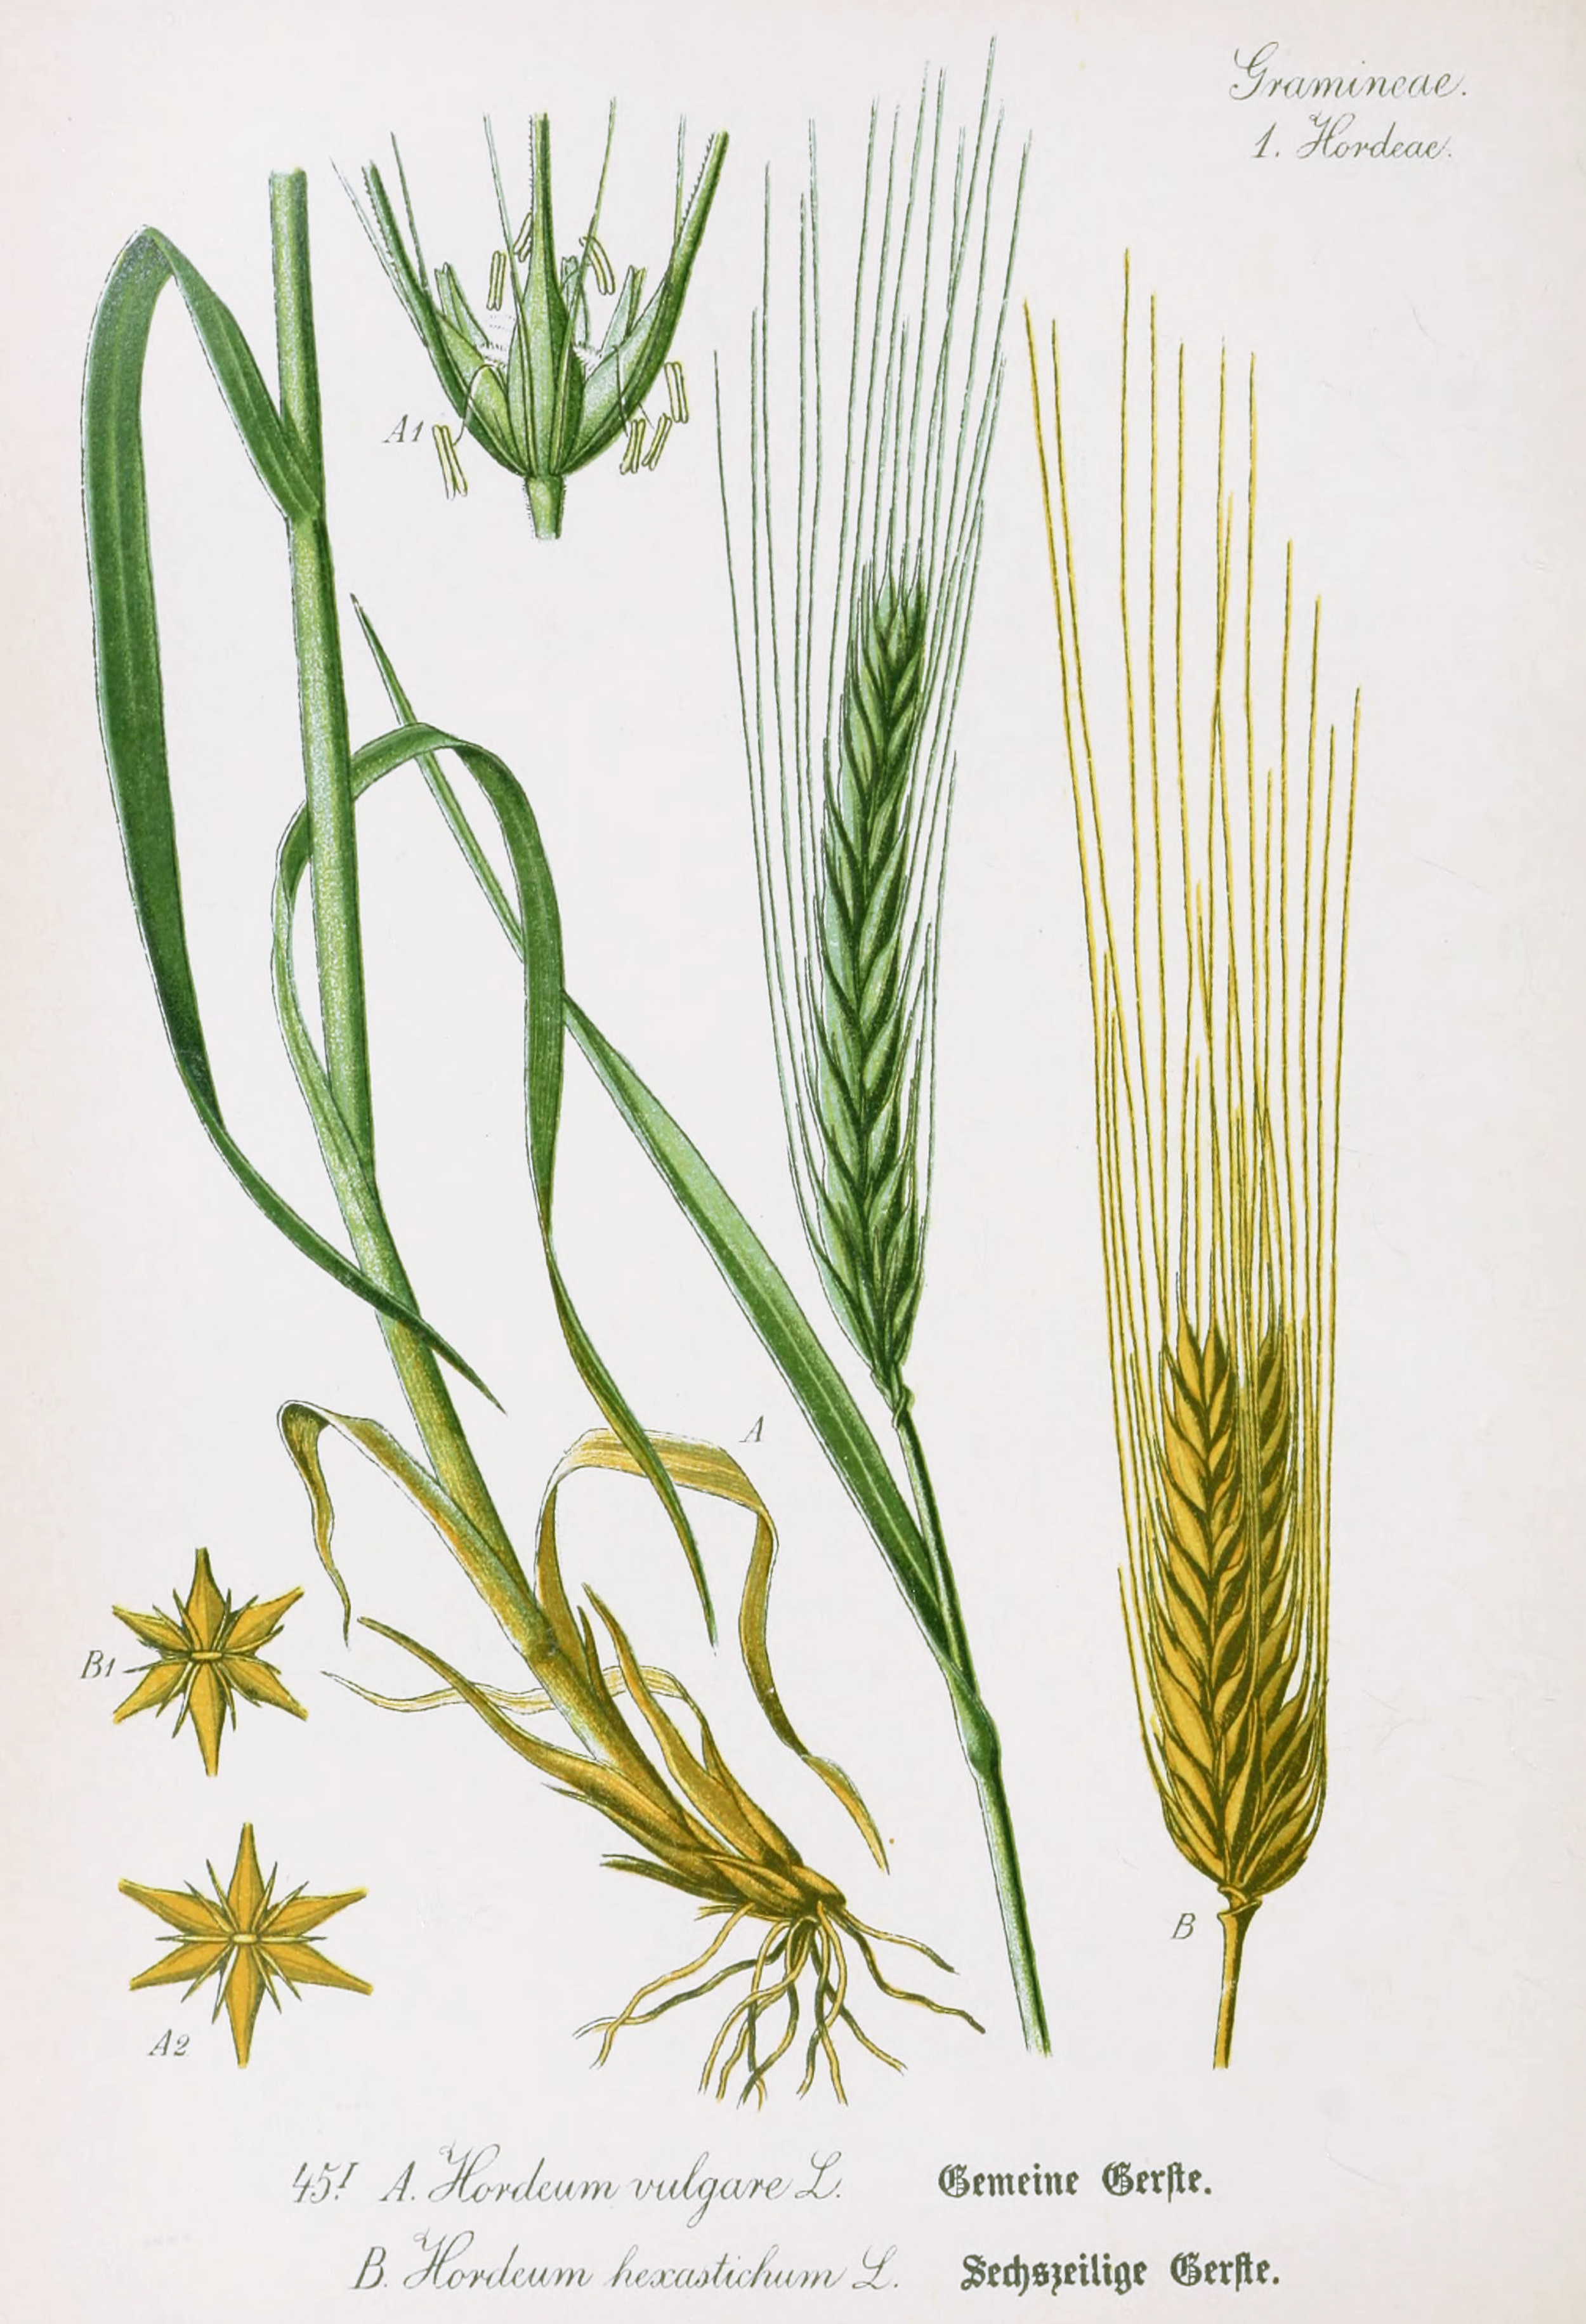 Barley Botanical Illustration from Flora of Germany circa 1903Wheat Botanical Illustration